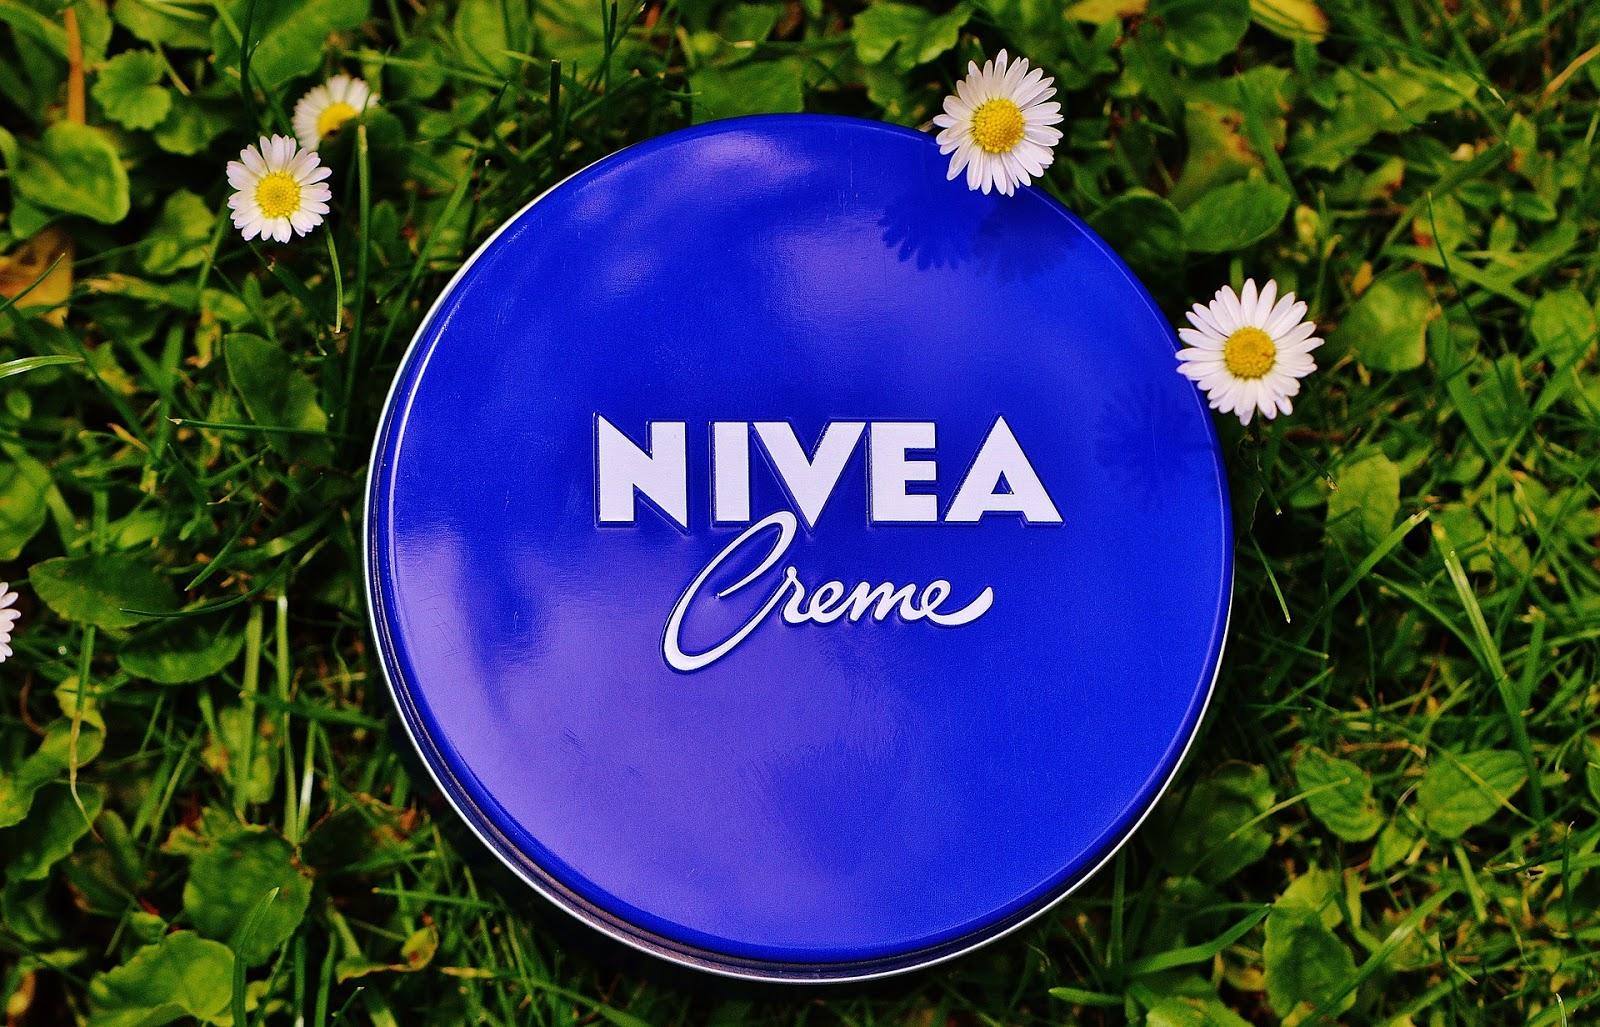 Krem Nivea - jeden kosmetyk a kilka zastosowań.